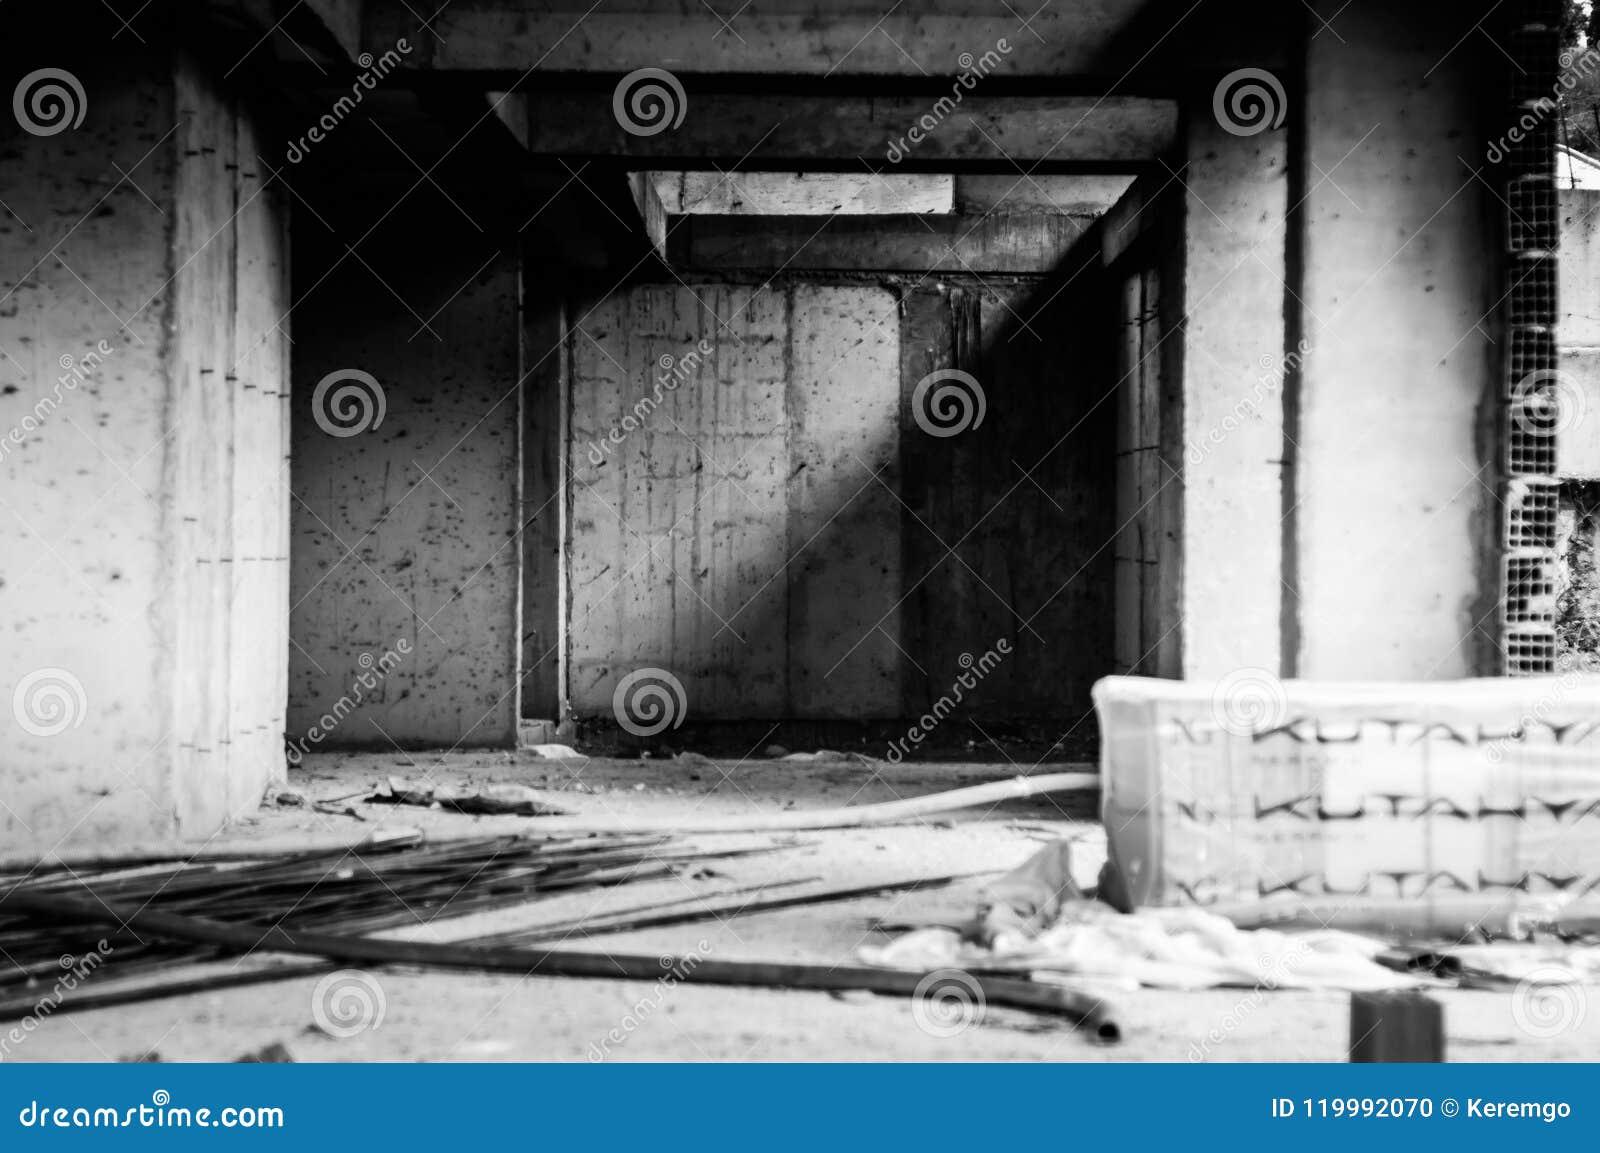 Ödelagd byggnadskonstruktion - Turkiet